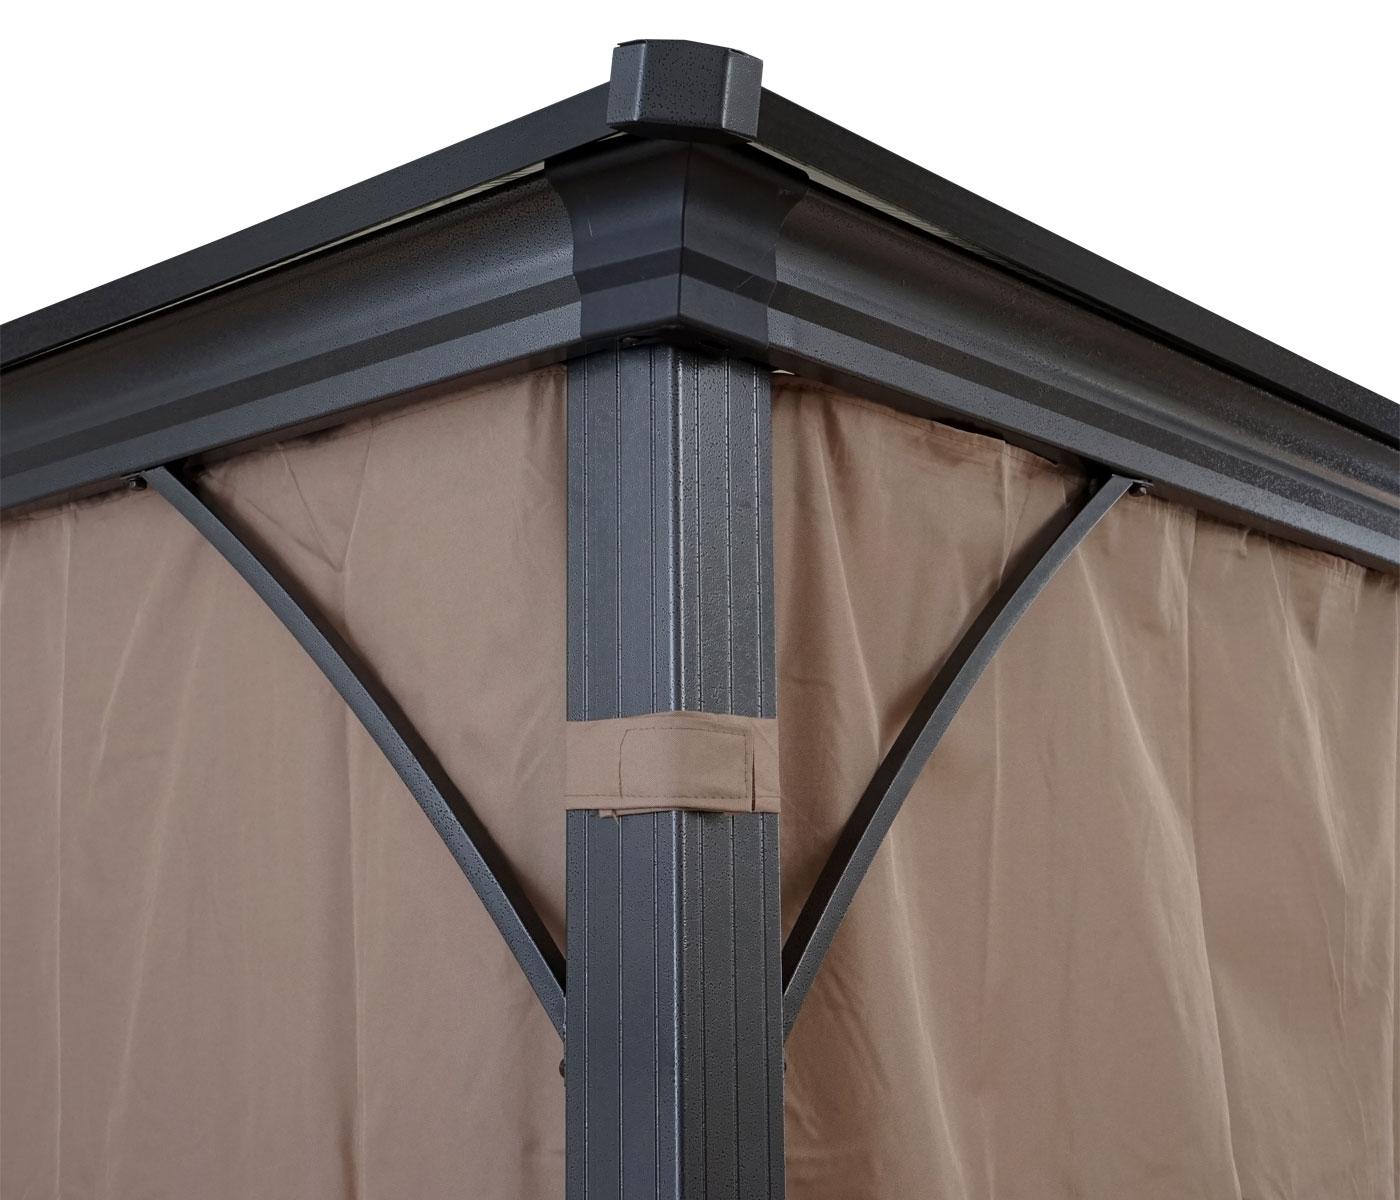 Hardtop Pergola Mcw C74 Garten Pavillon Kunststoff Dach Seitenwand